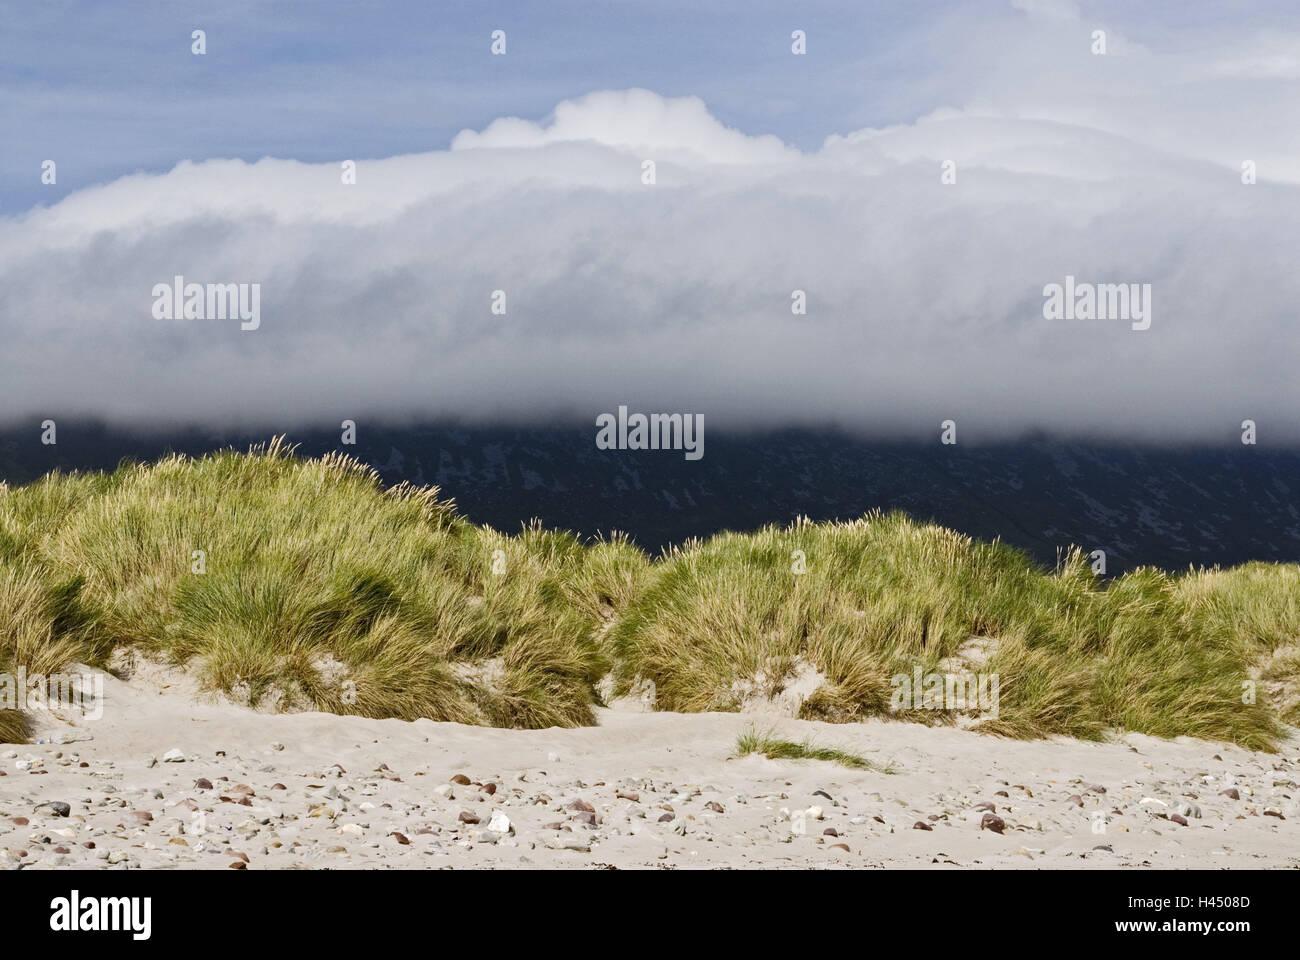 Ireland, Mayo, Achilles Iceland, Keel, beach, dune grass, clouds, heavens, blue, Connacht, coast, sandy beach, dune, - Stock Image